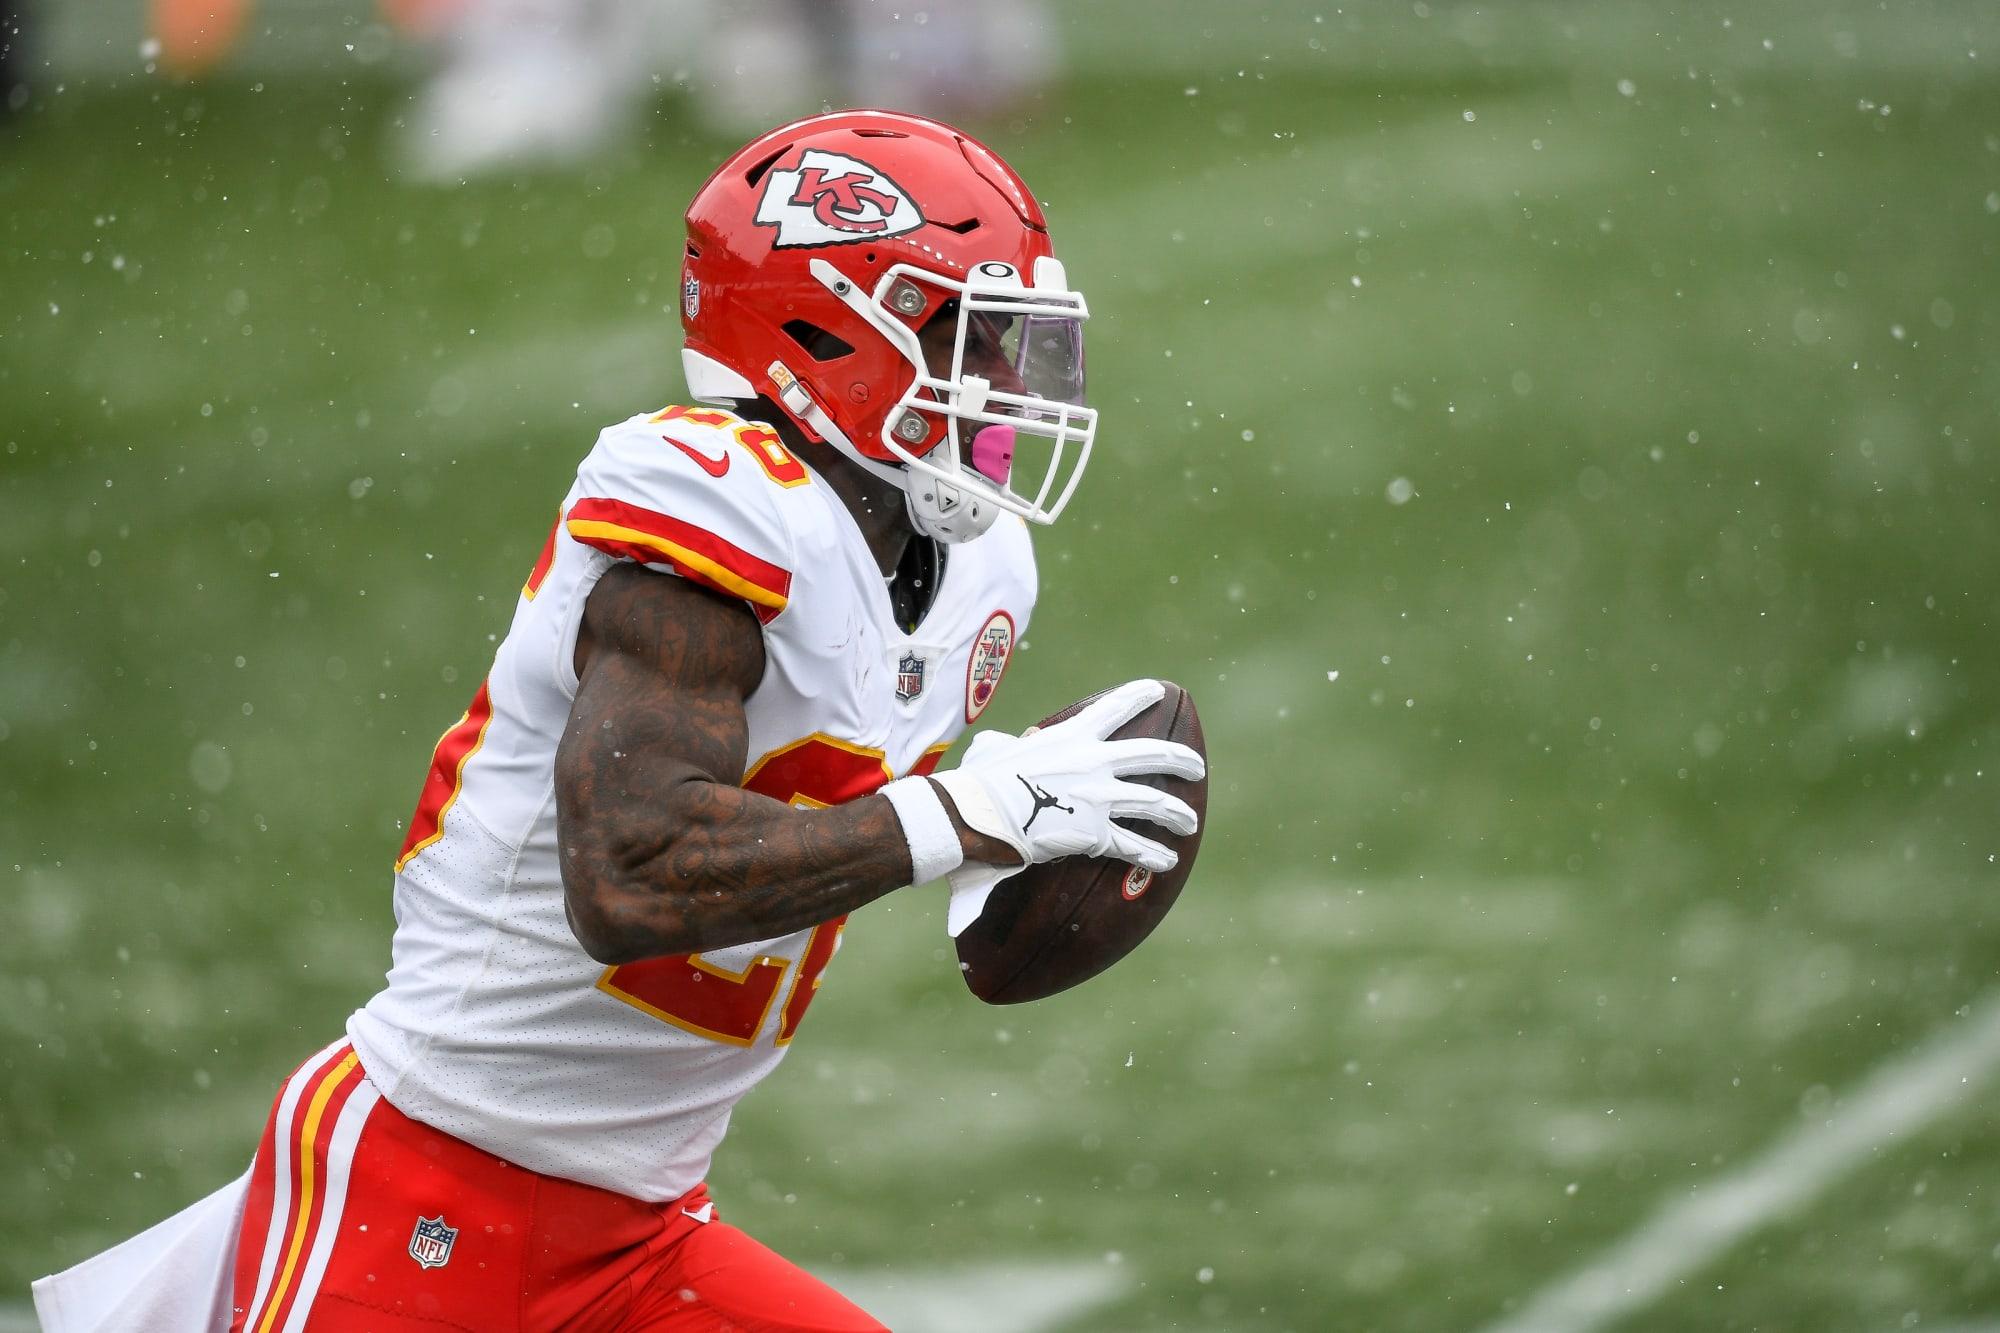 NFL expert picks predict Chiefs will steamroll Jets in Week 7